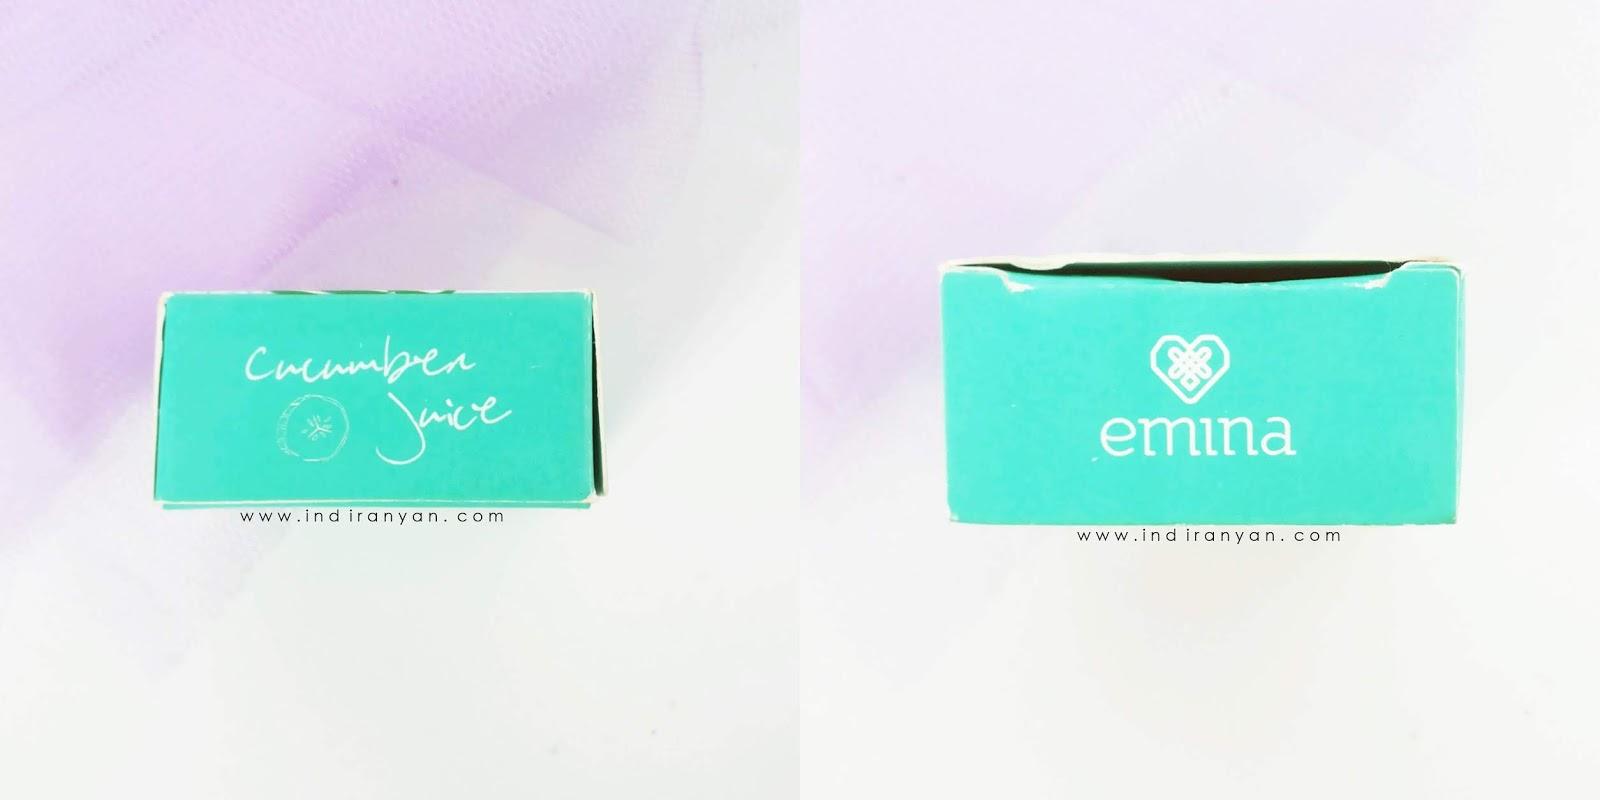 emina-smoochies-lip-balm-review, review-lip-balm-emina, emina-lip-balm